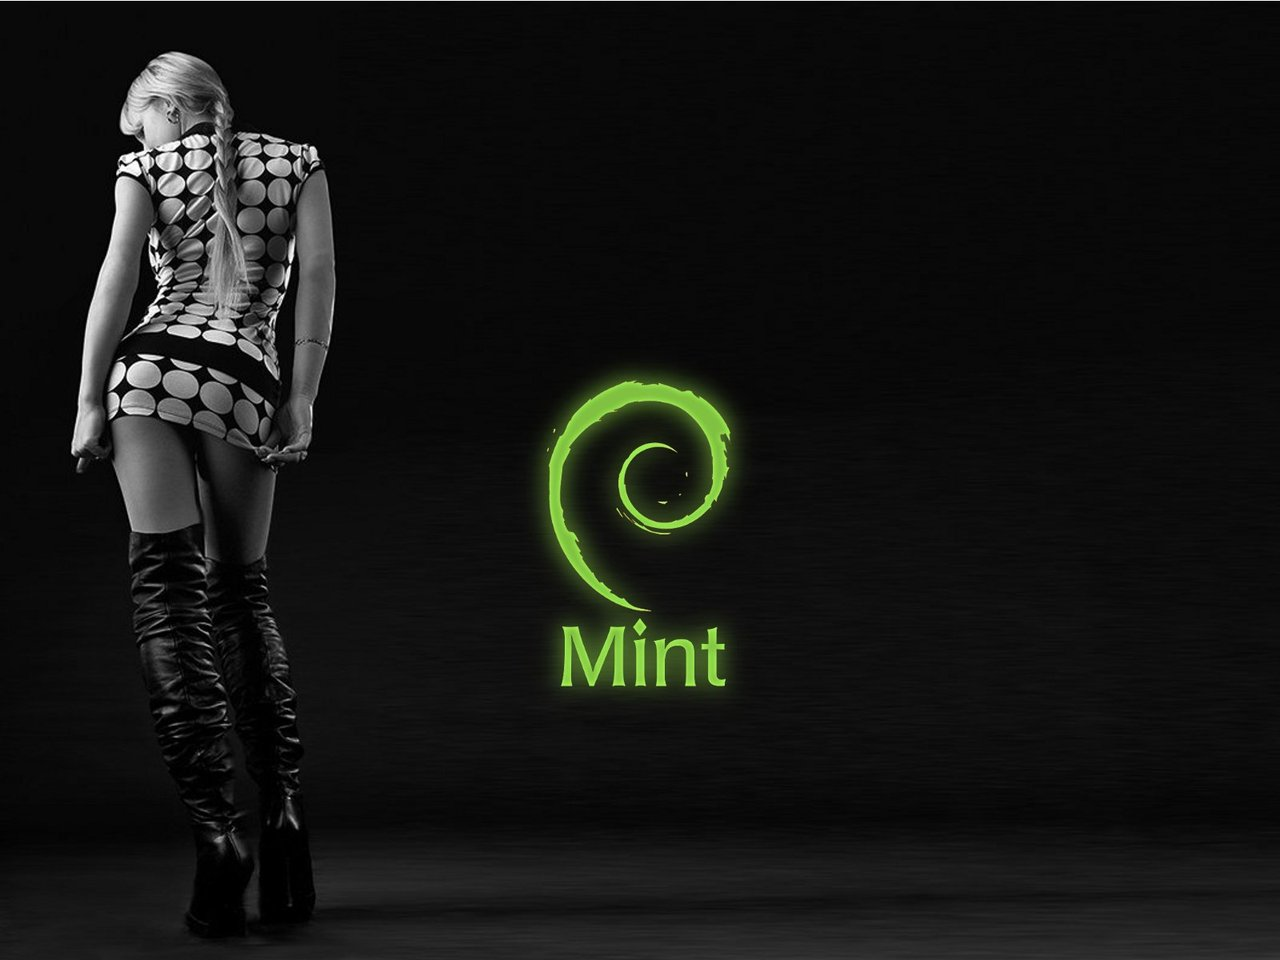 linux mint qiana wallpapers